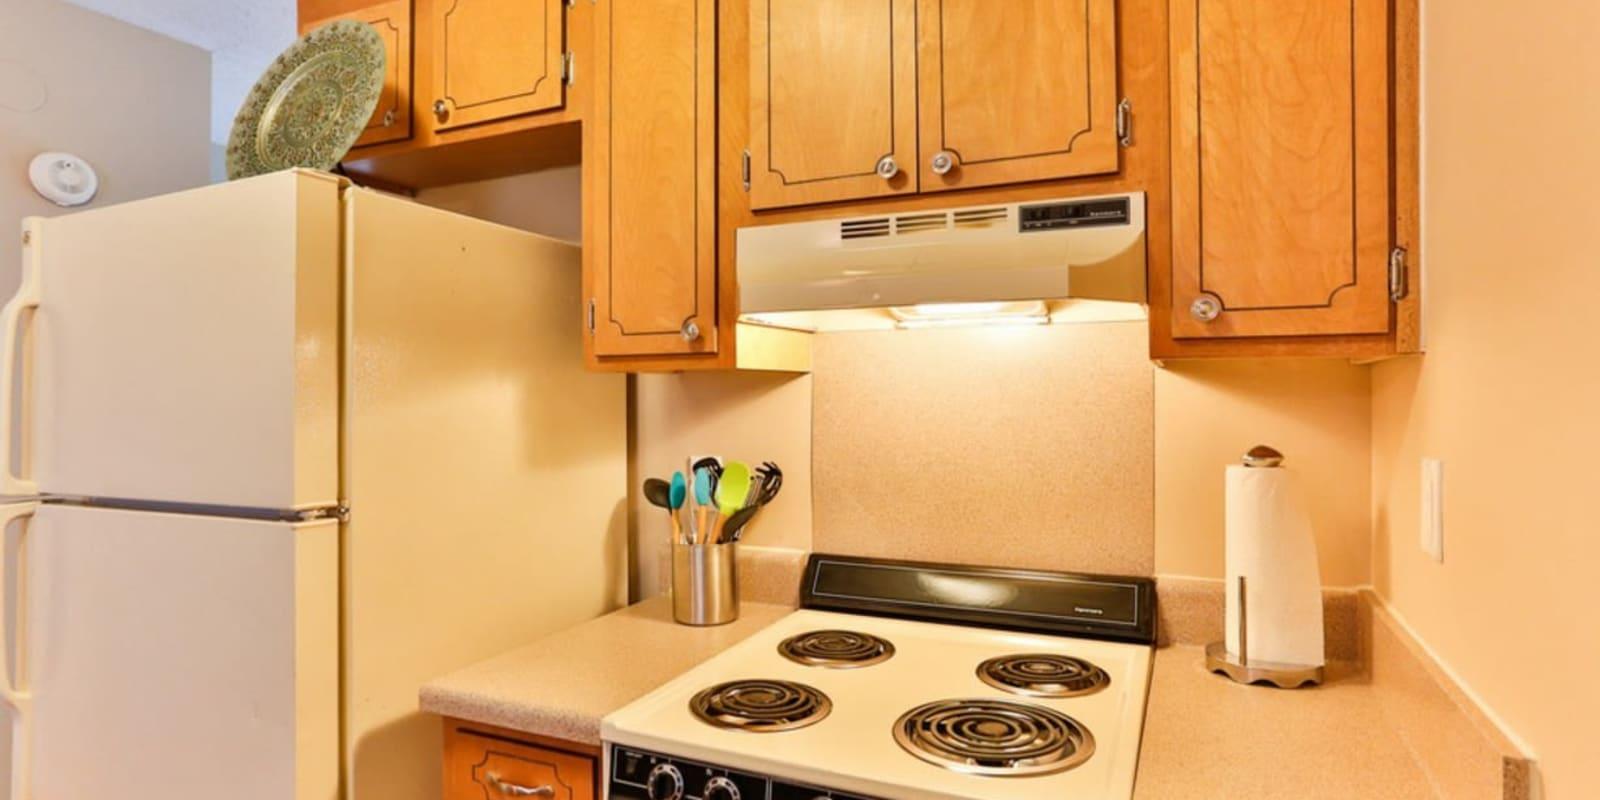 Kitchen with white appliances at Huntersville Apartment Homes in Huntersville, North Carolina